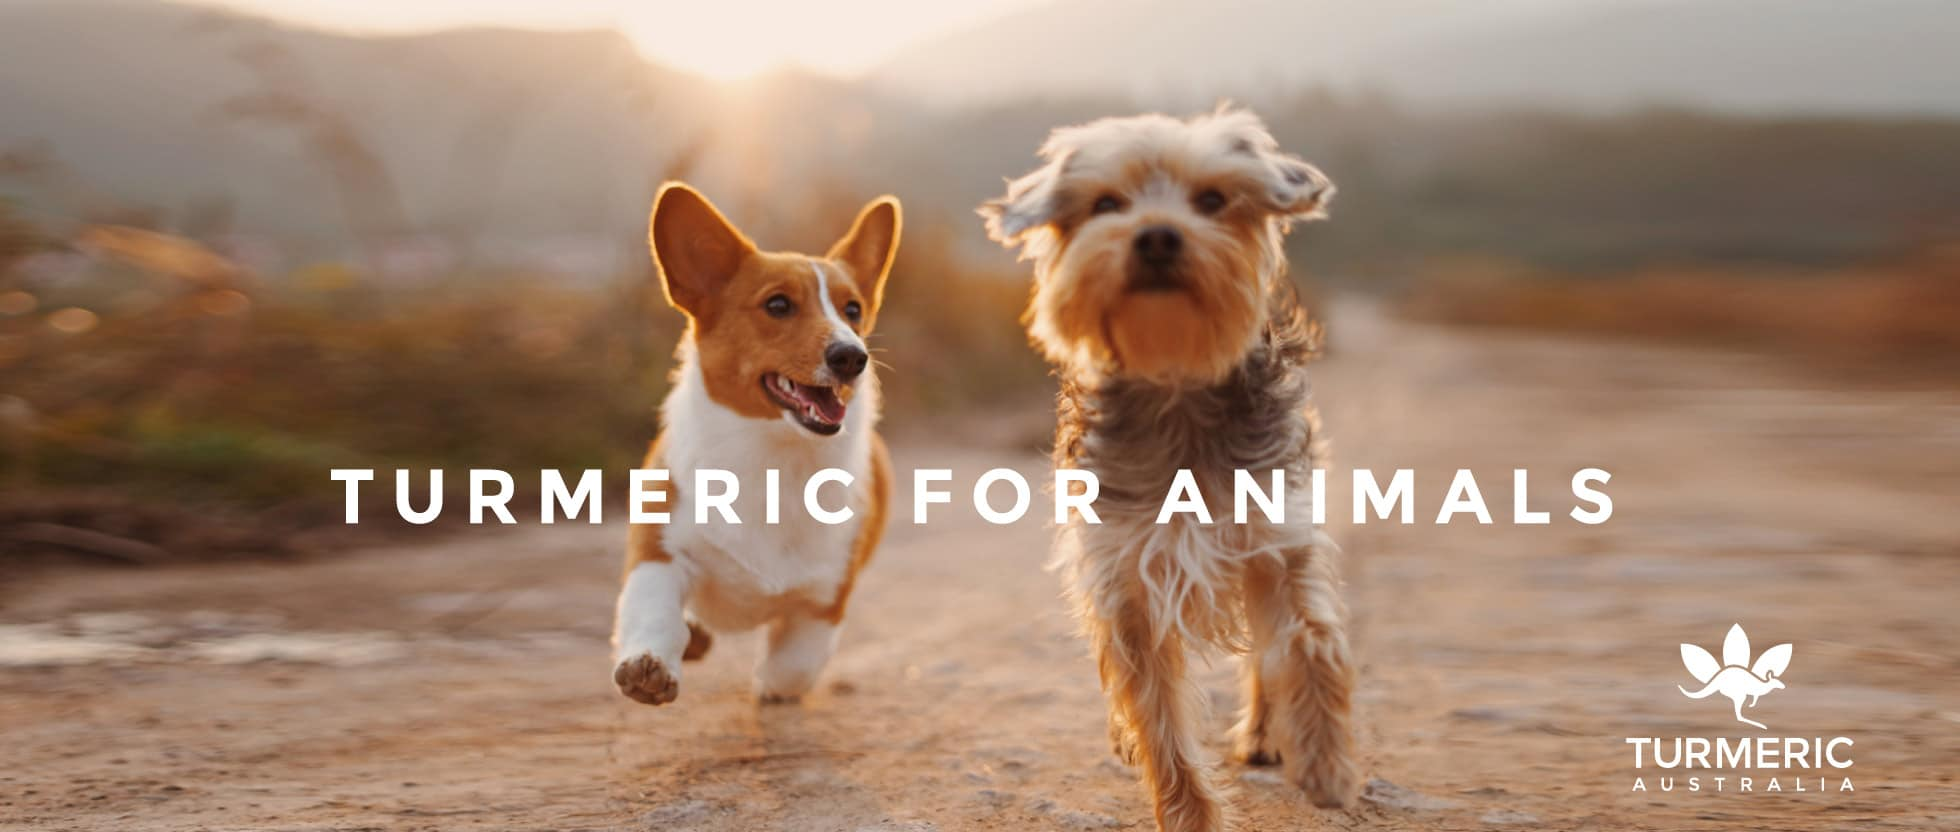 turmeric for animals